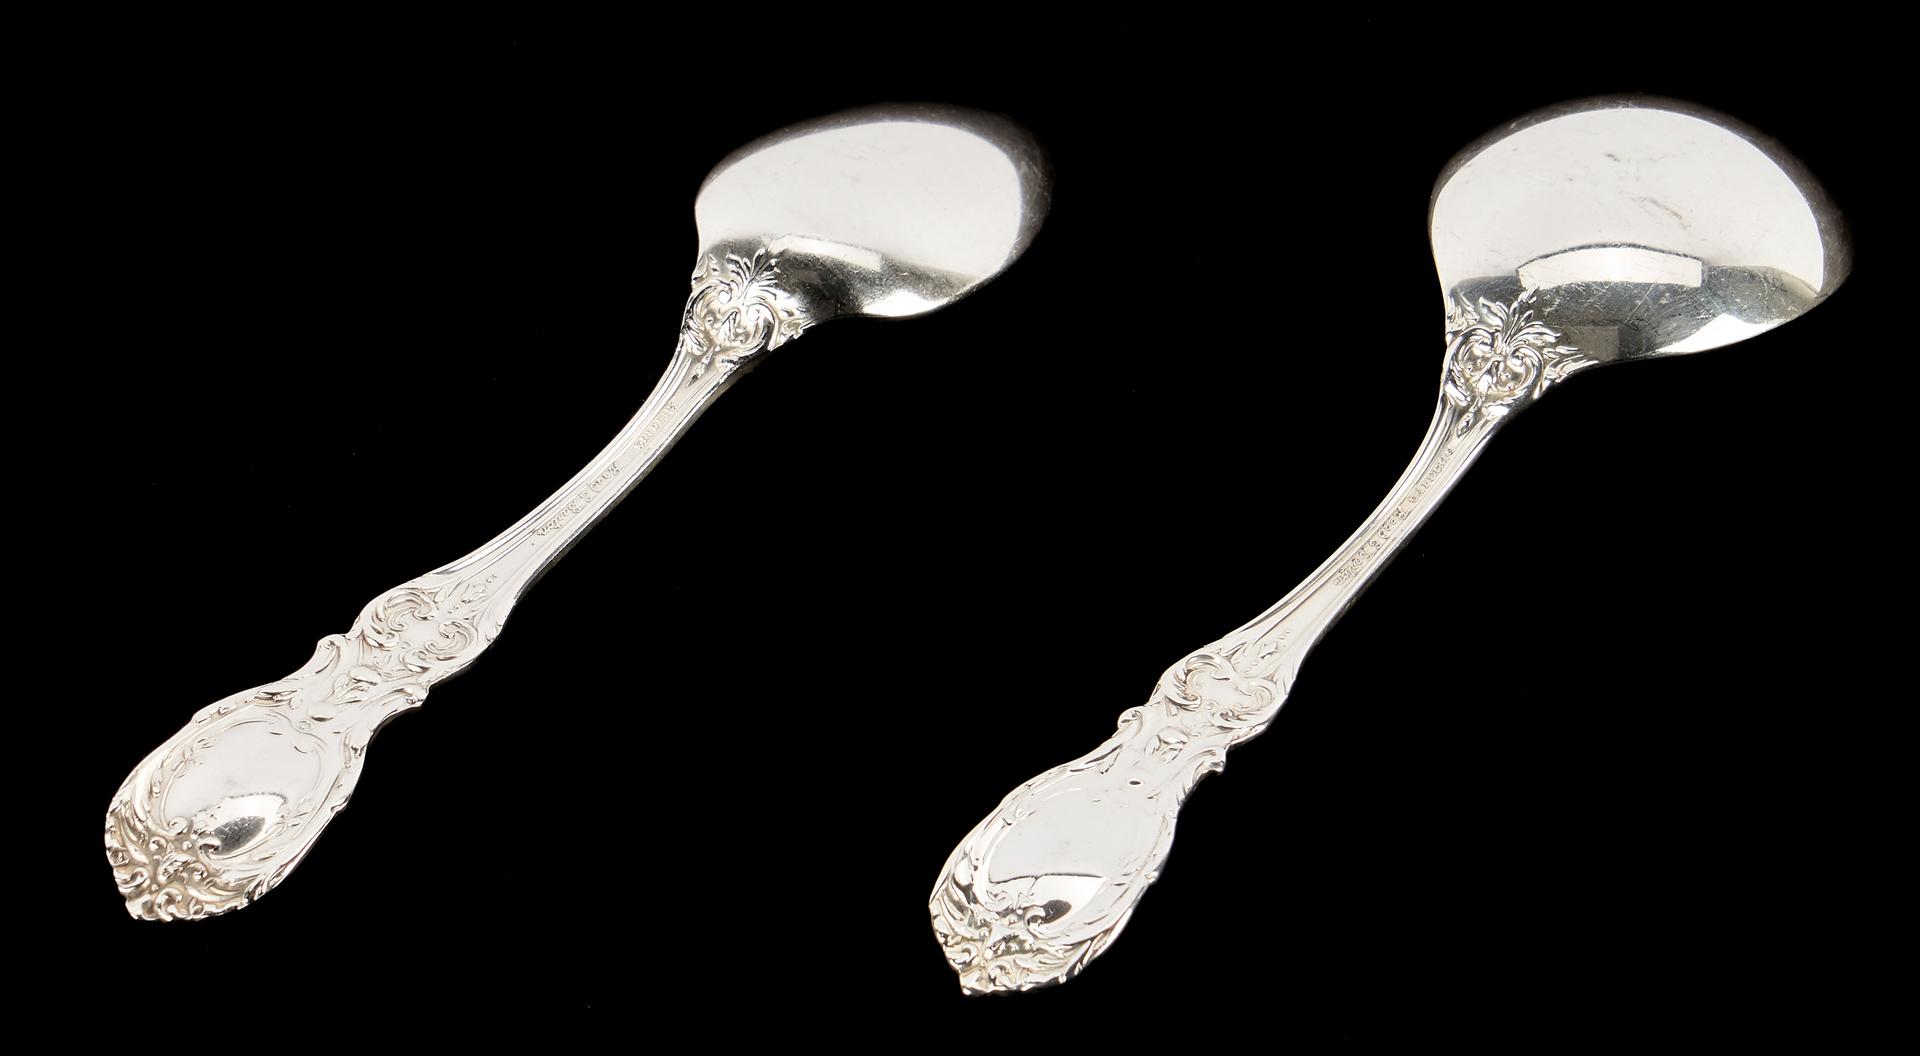 Lot 274: 104 pcs. Reed & Barton Francis I Sterling Silver Flatware